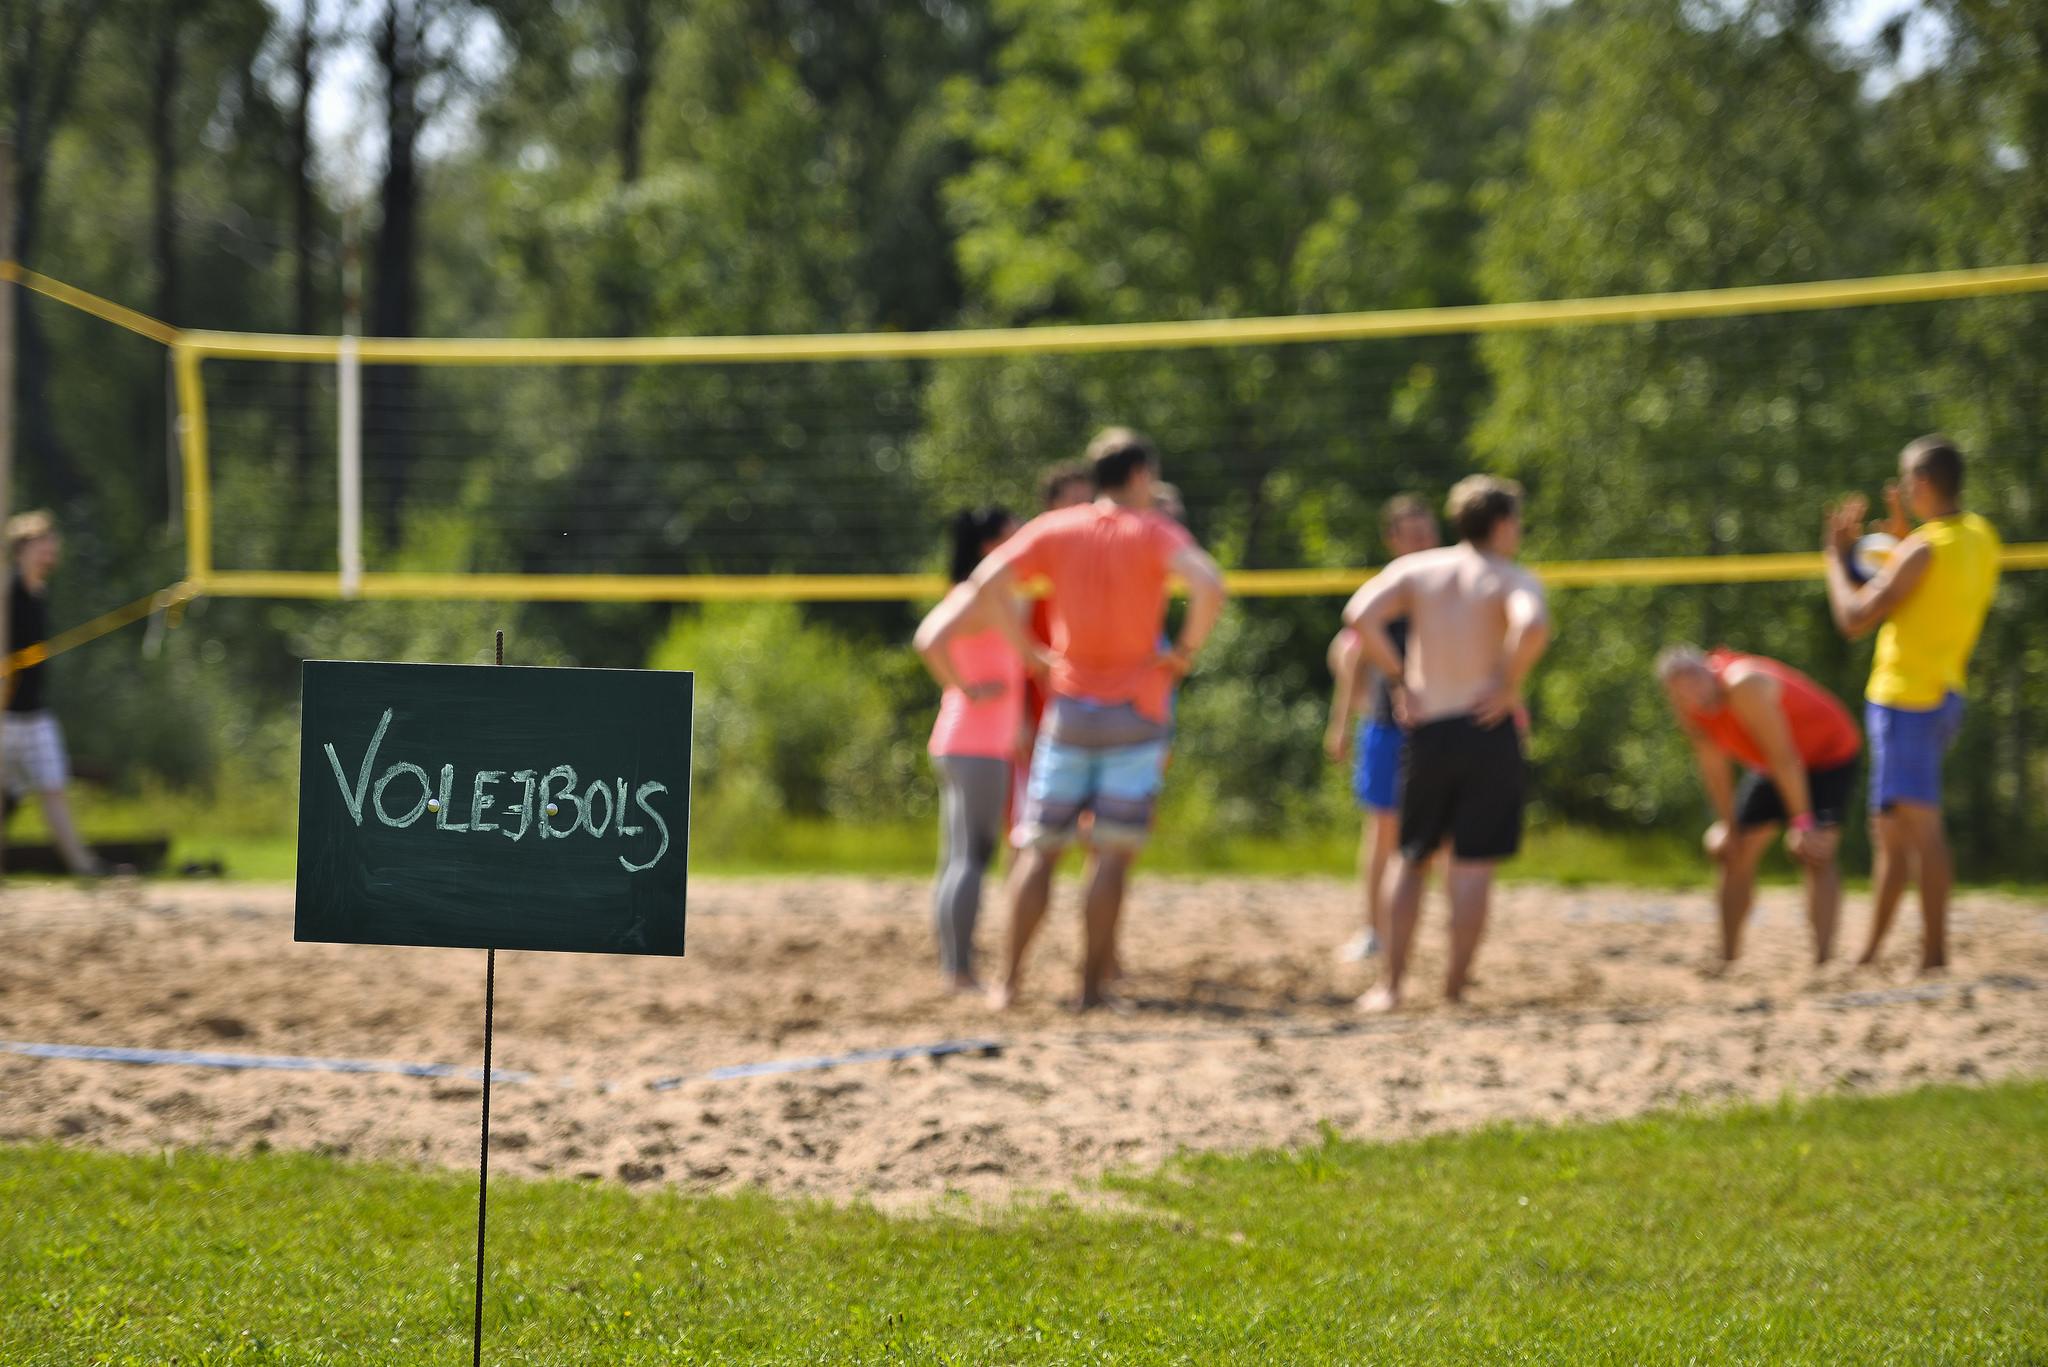 sporta-speles-volejbols